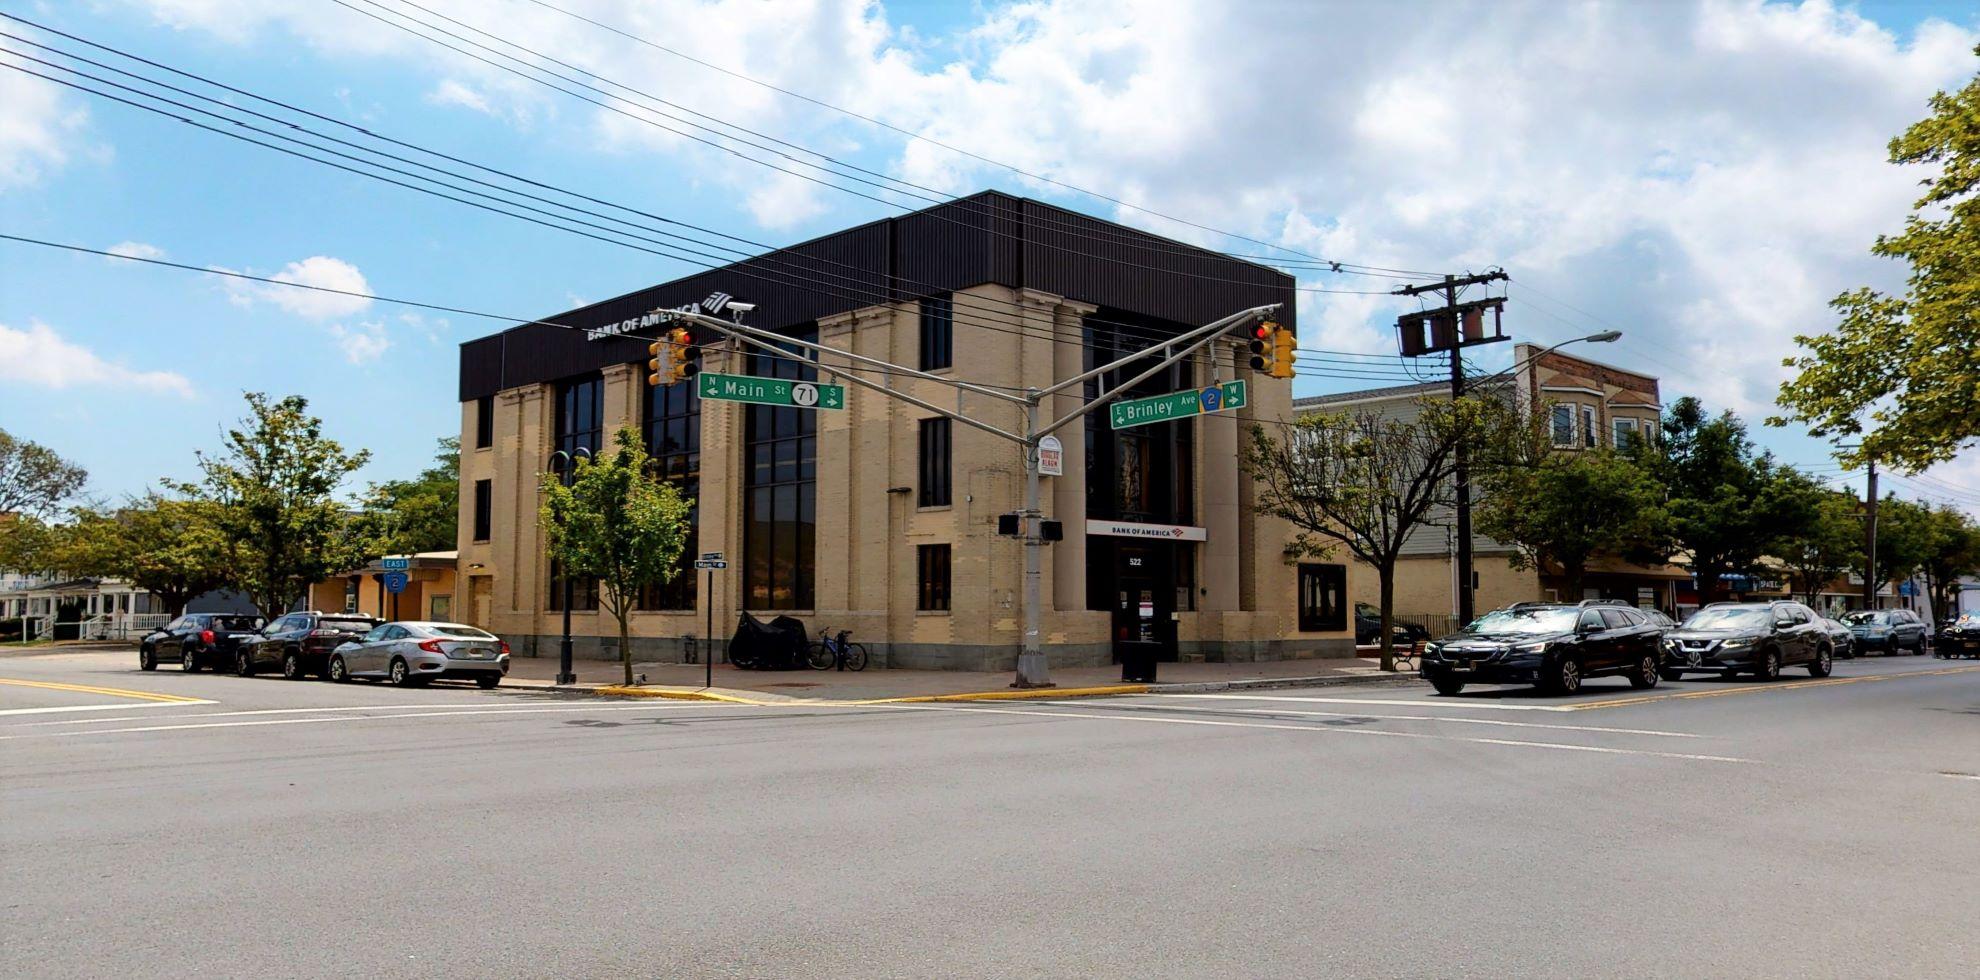 Bank of America financial center with drive-thru ATM | 522 Main St, Bradley Beach, NJ 07720